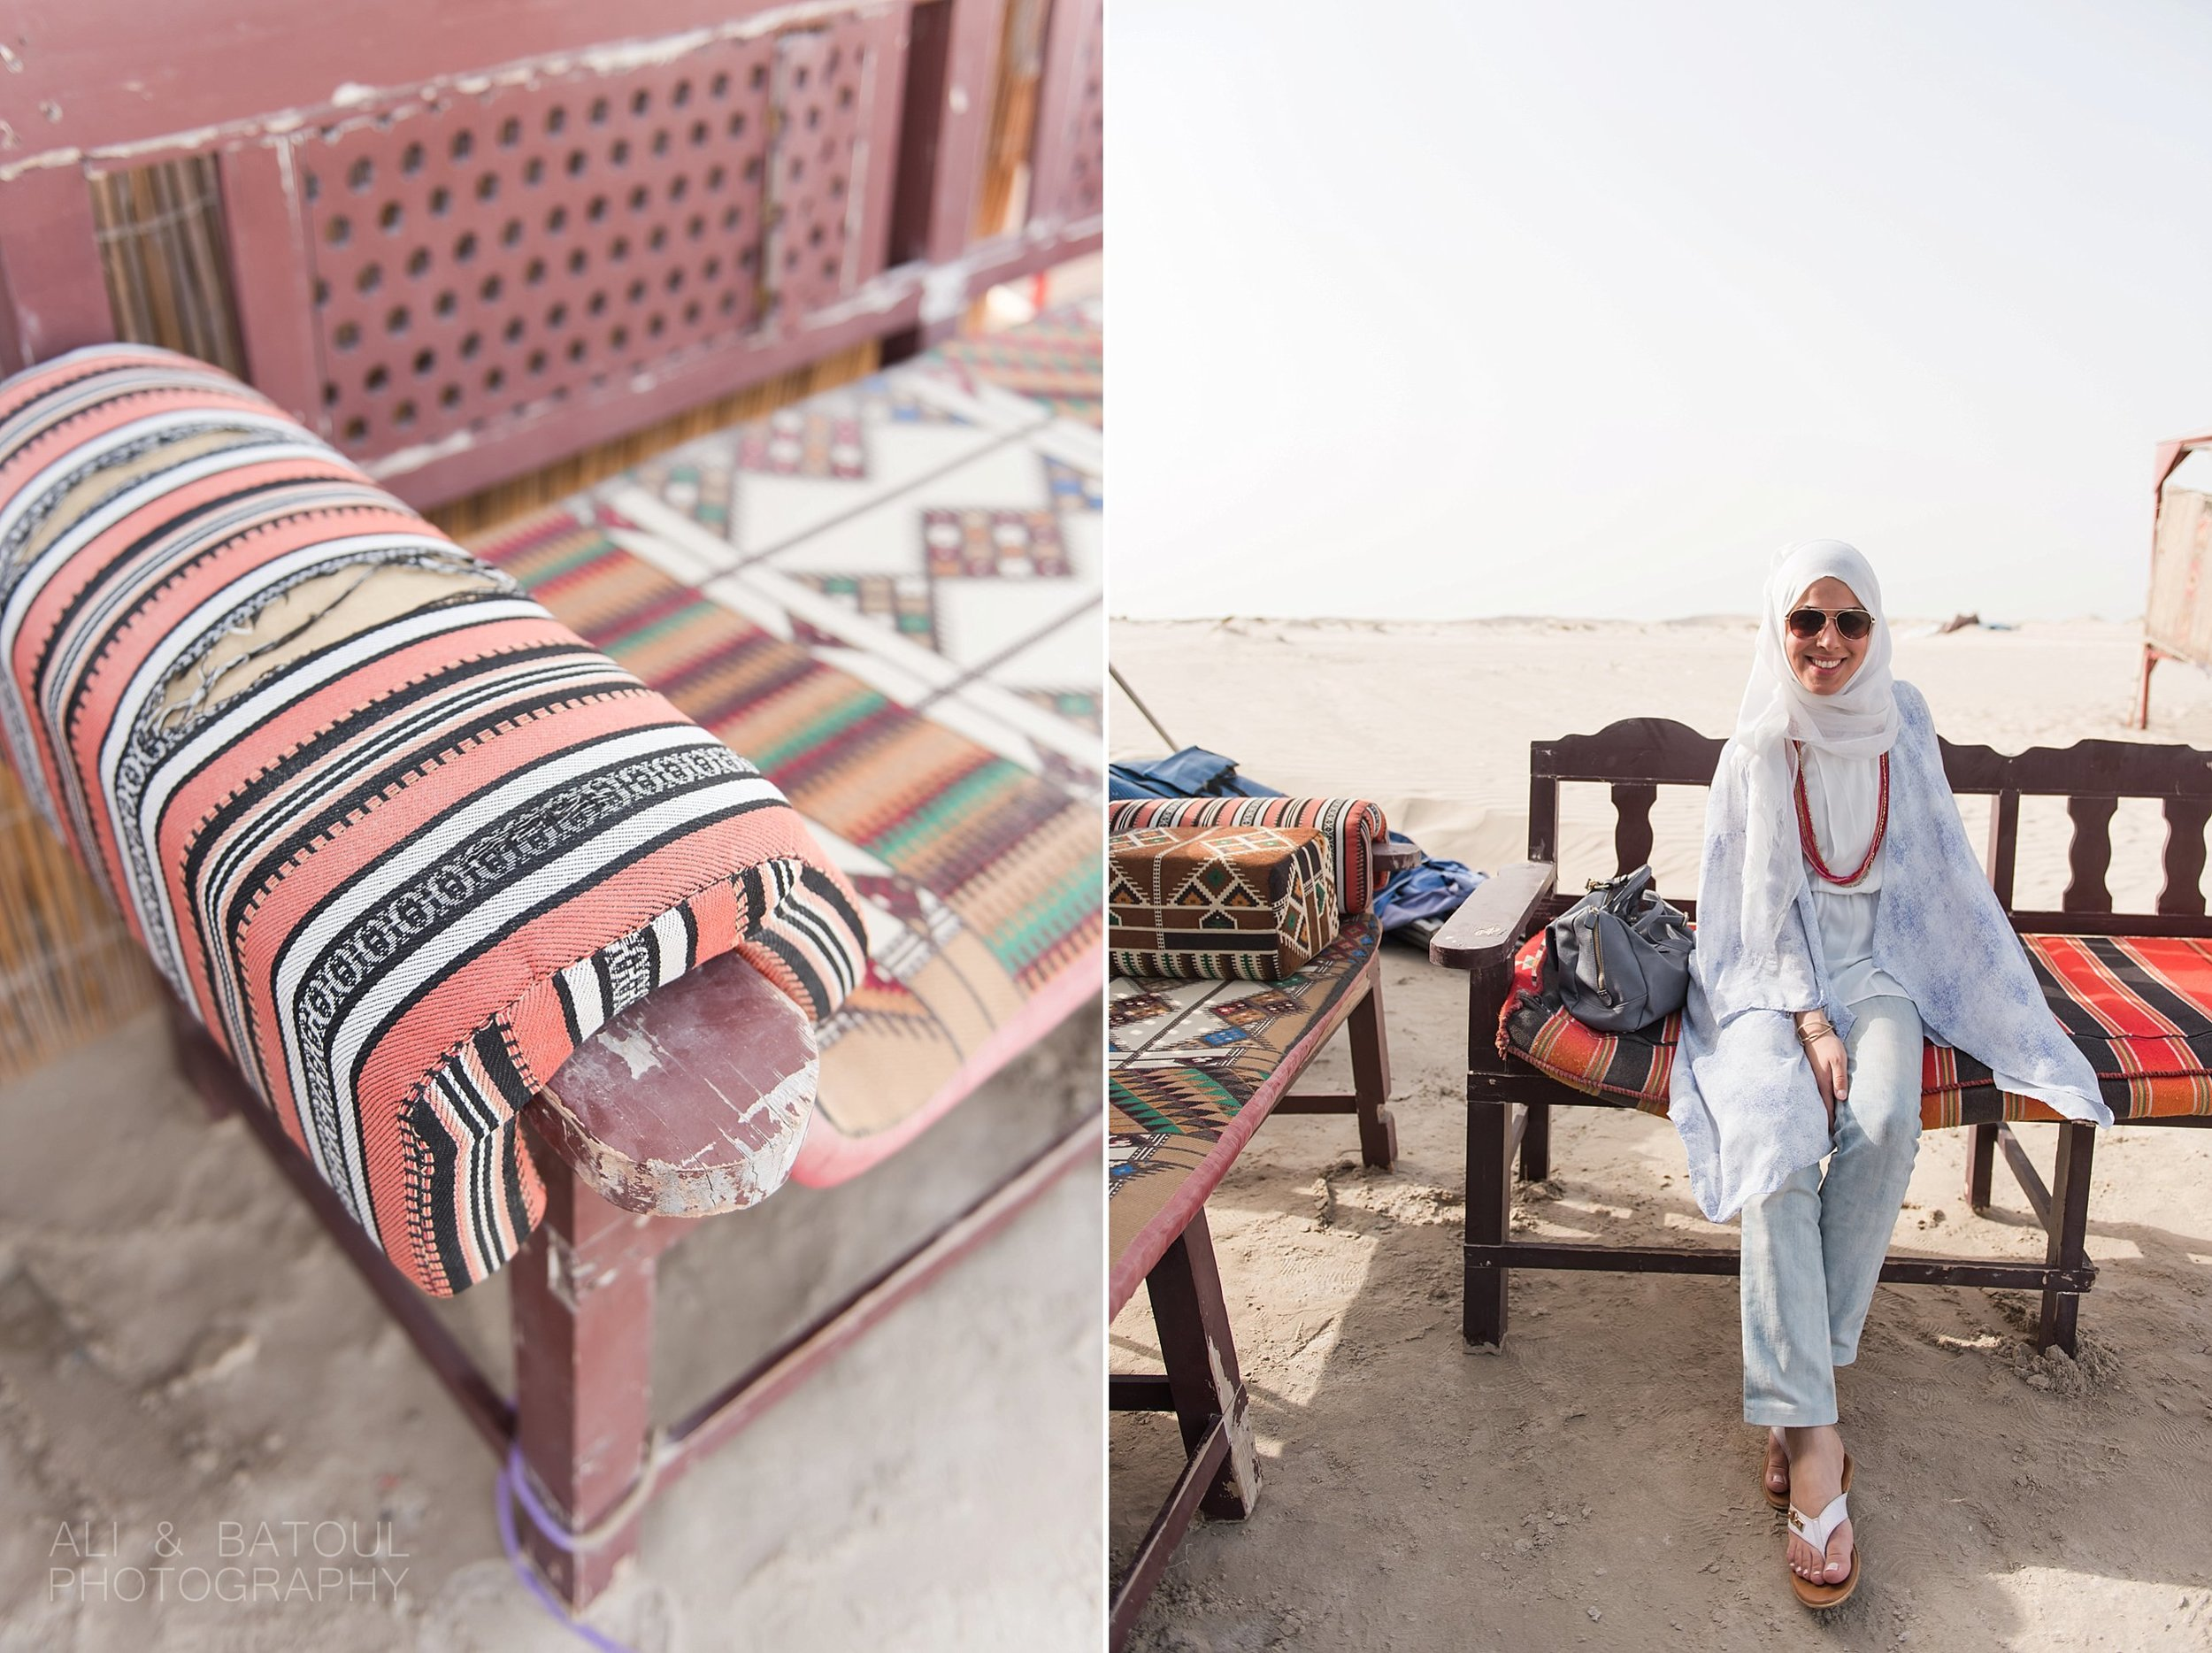 Ali & Batoul Photography - Doha Travel Photography_0061.jpg